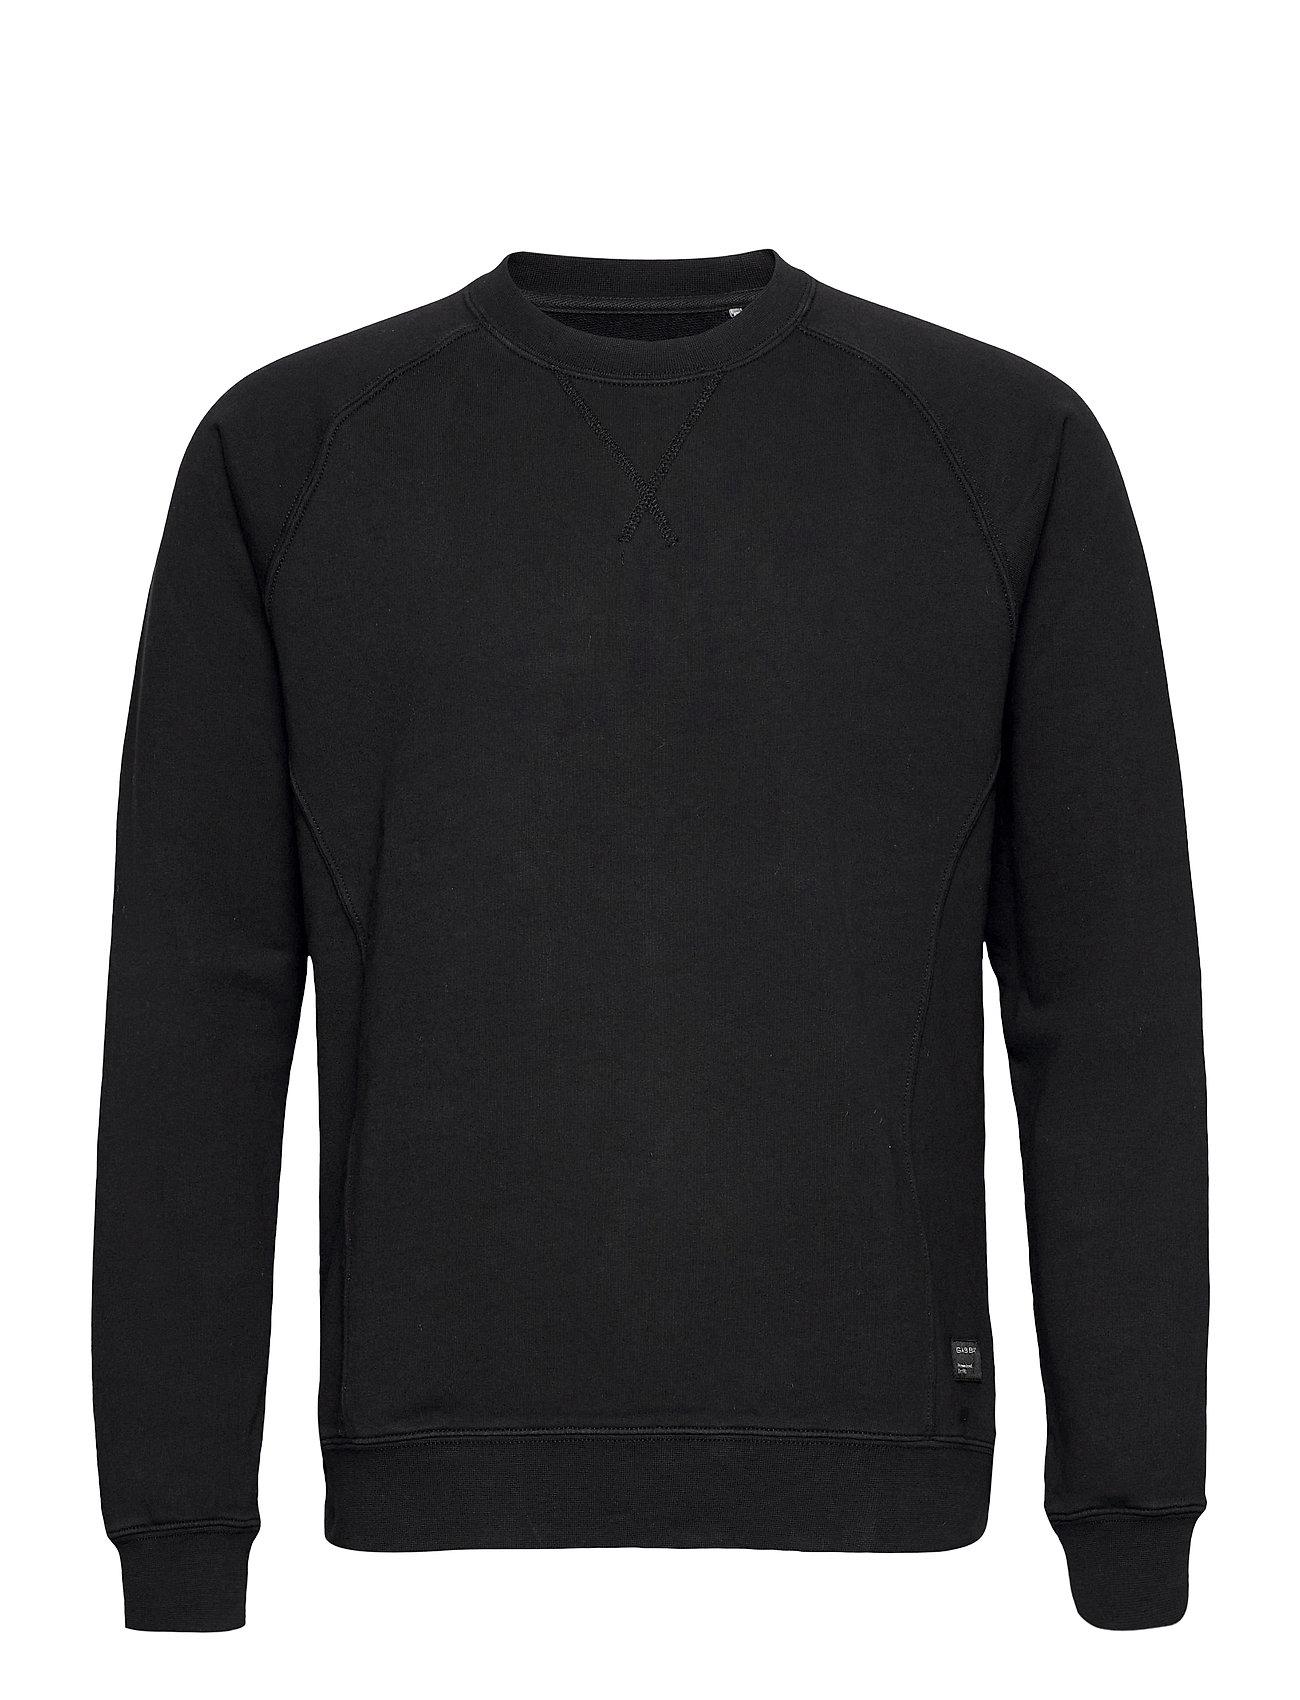 Image of Nine Crew Neck Sweat Sweatshirt Trøje Gabba (3501574805)